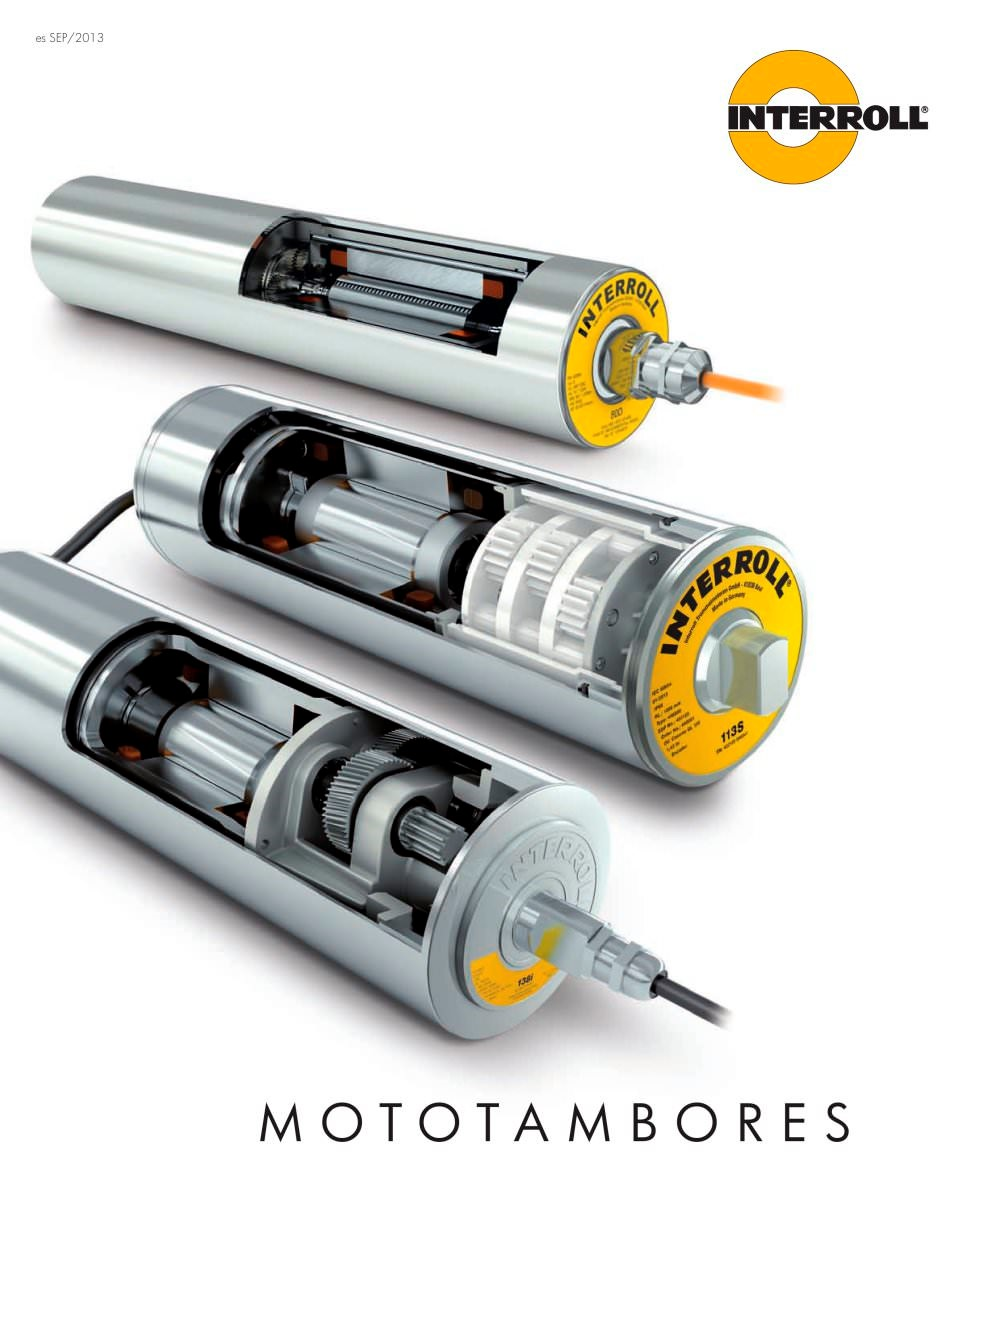 (Español) Mototambores, rodillos transporte, almacenes inteligentes